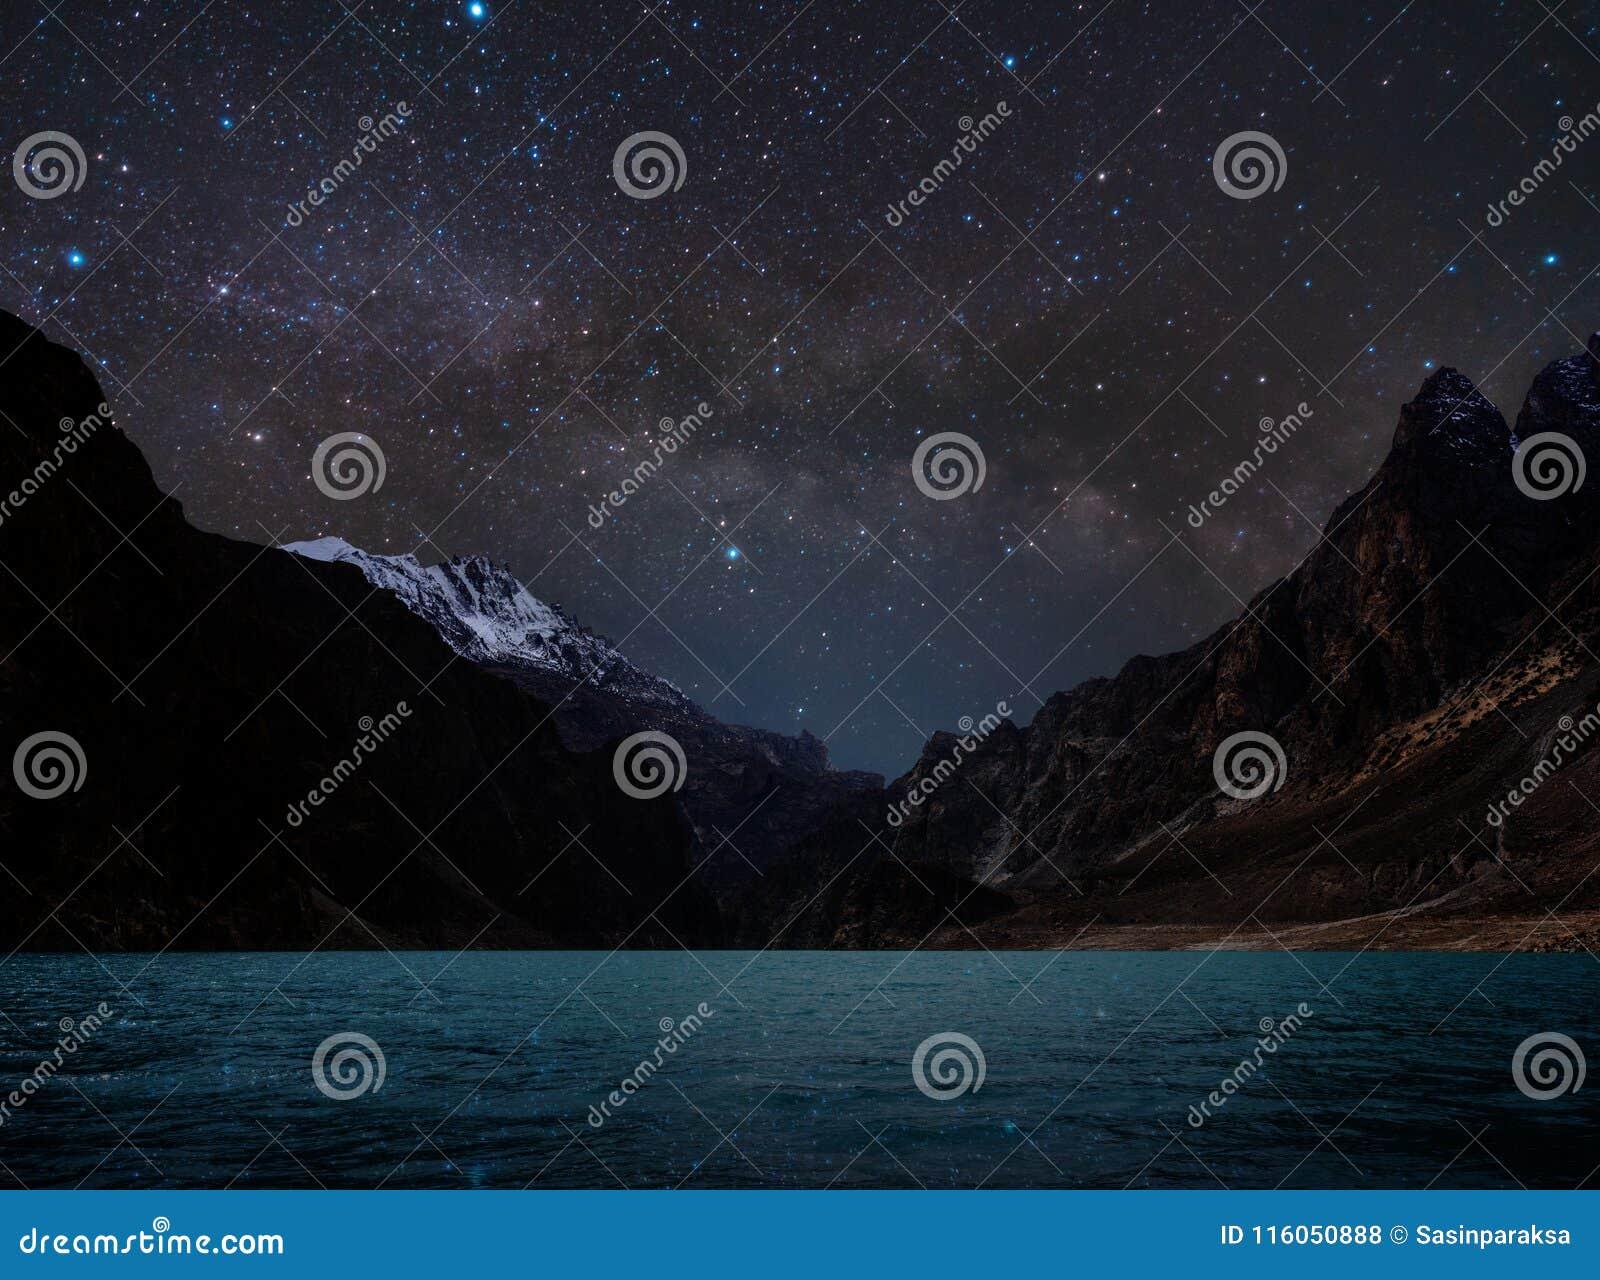 Гора ландшафта, силуэта ночи с водой на озере и небо вполне звезды с млечным путем